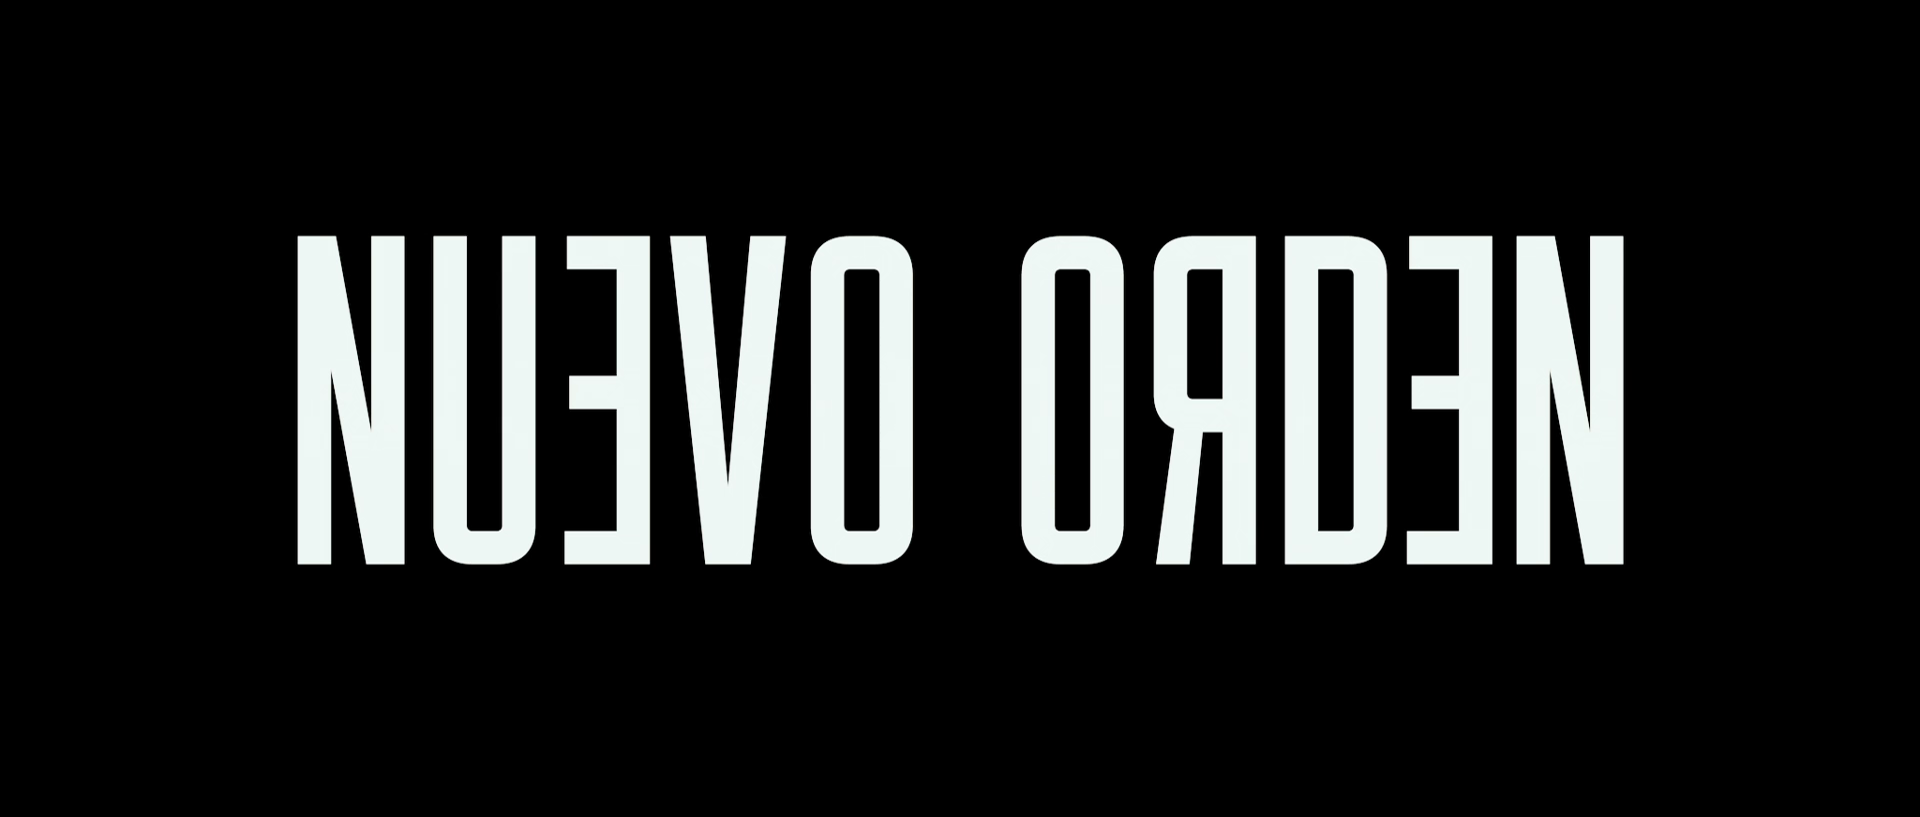 Nuevo orden (2020) 1080p WEB-DL AMZN Latino